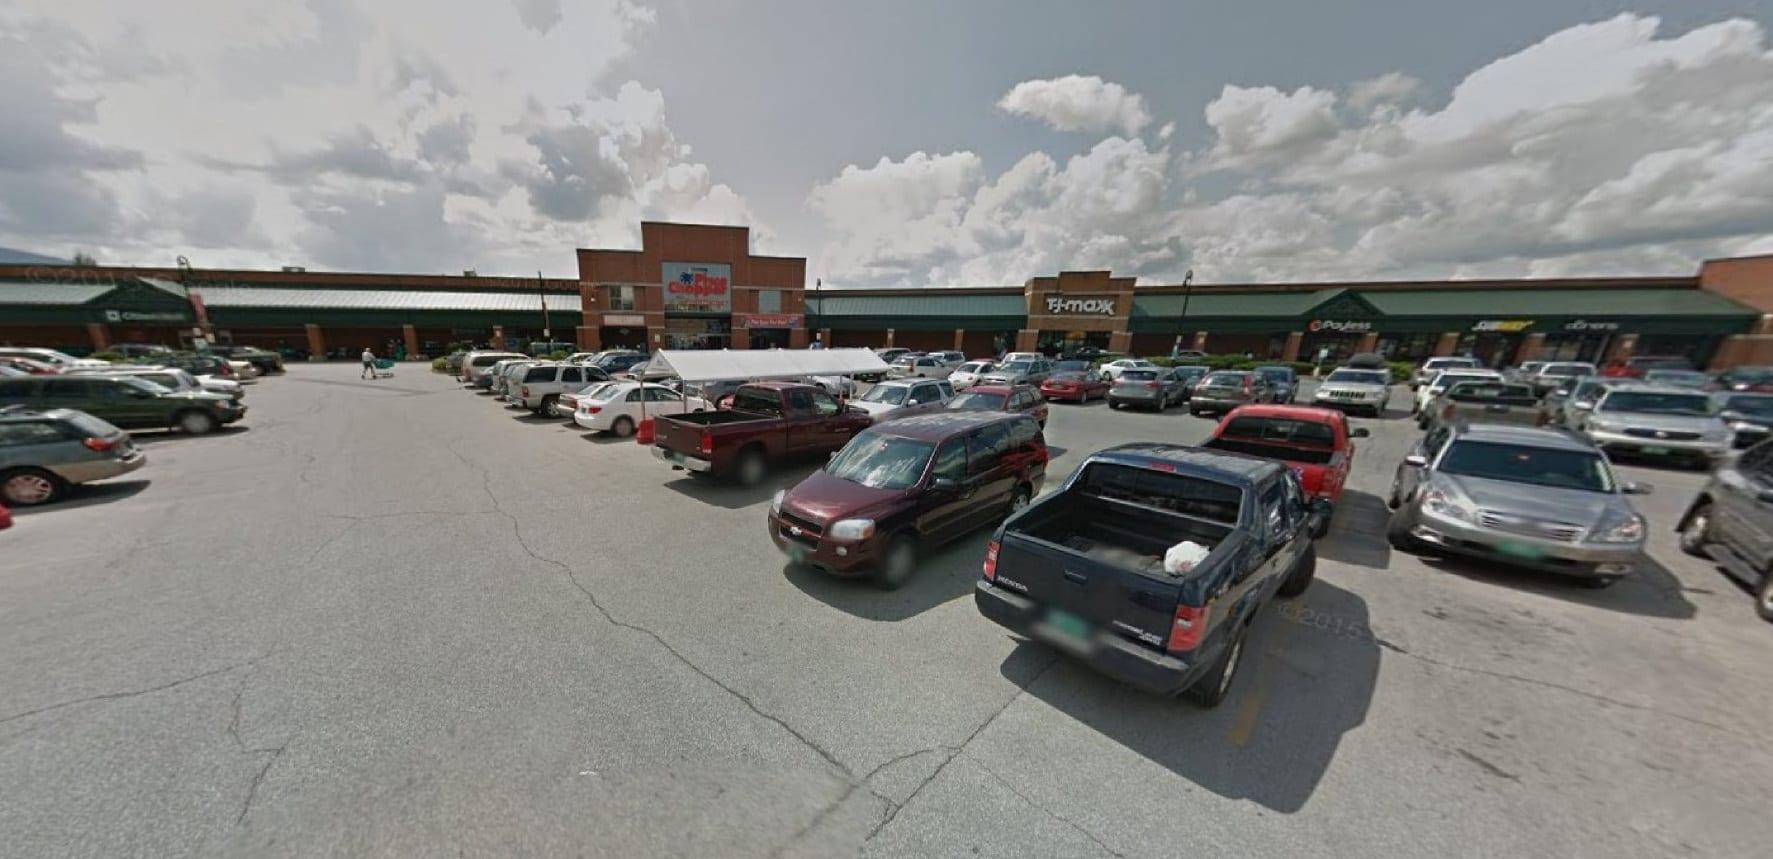 Rutland Shopping area